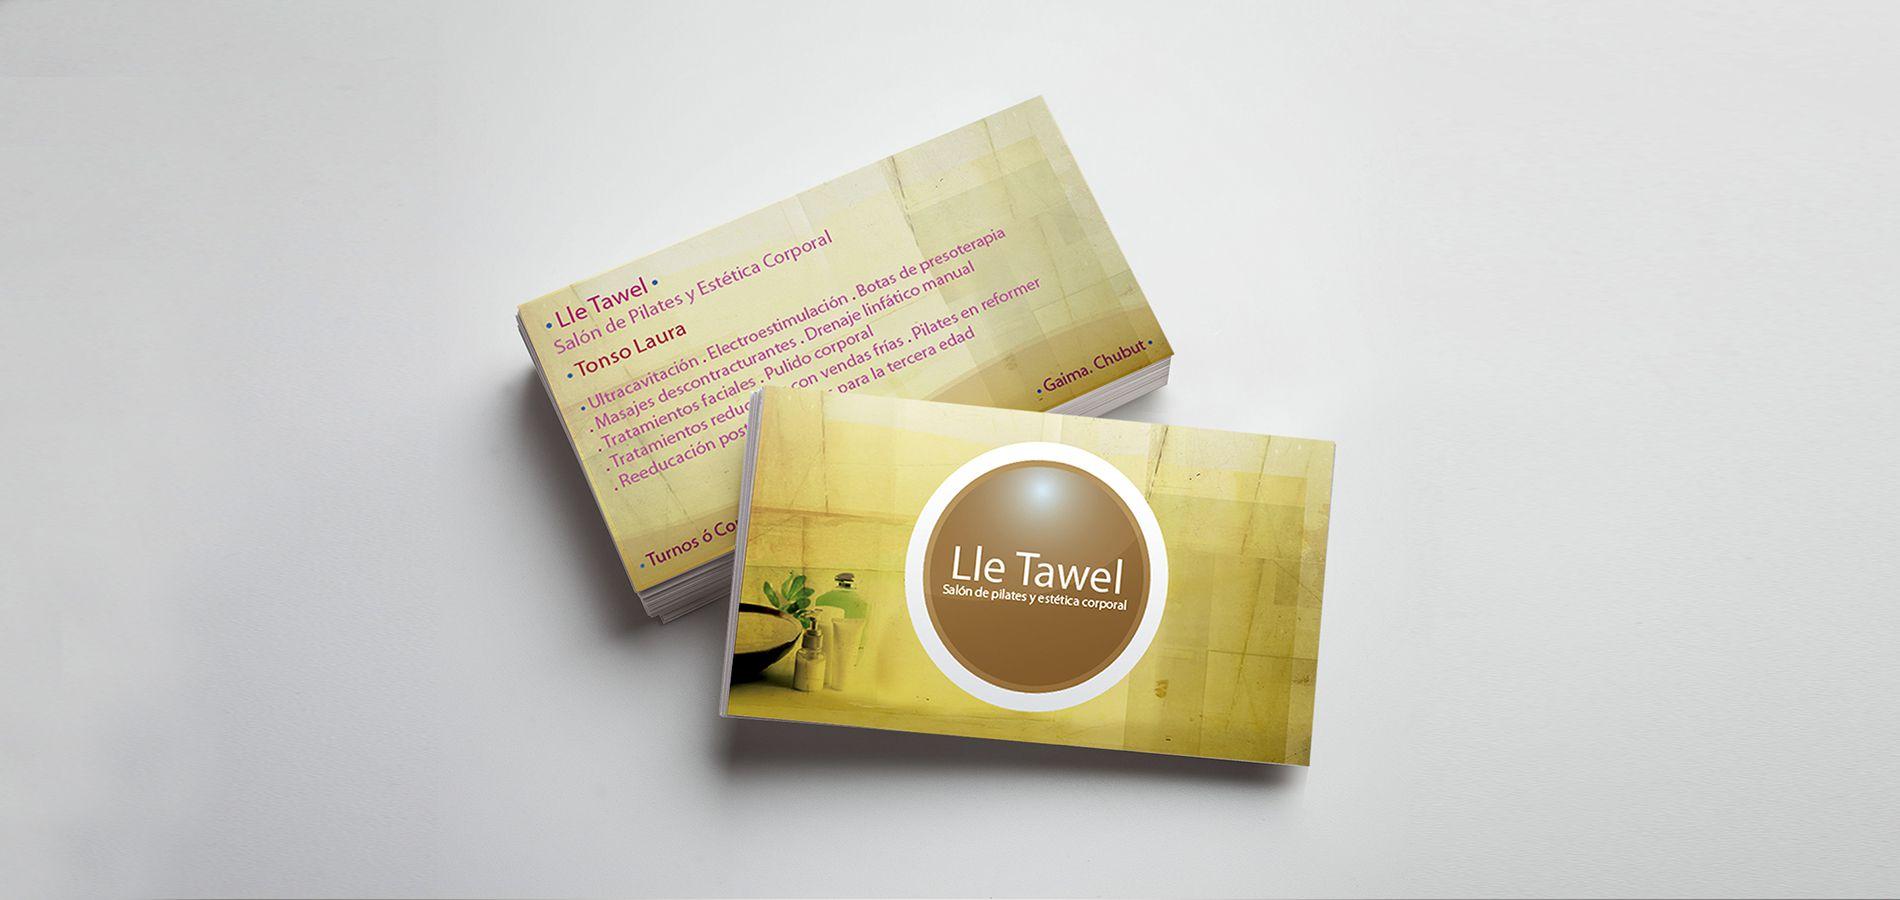 Lle Tawel